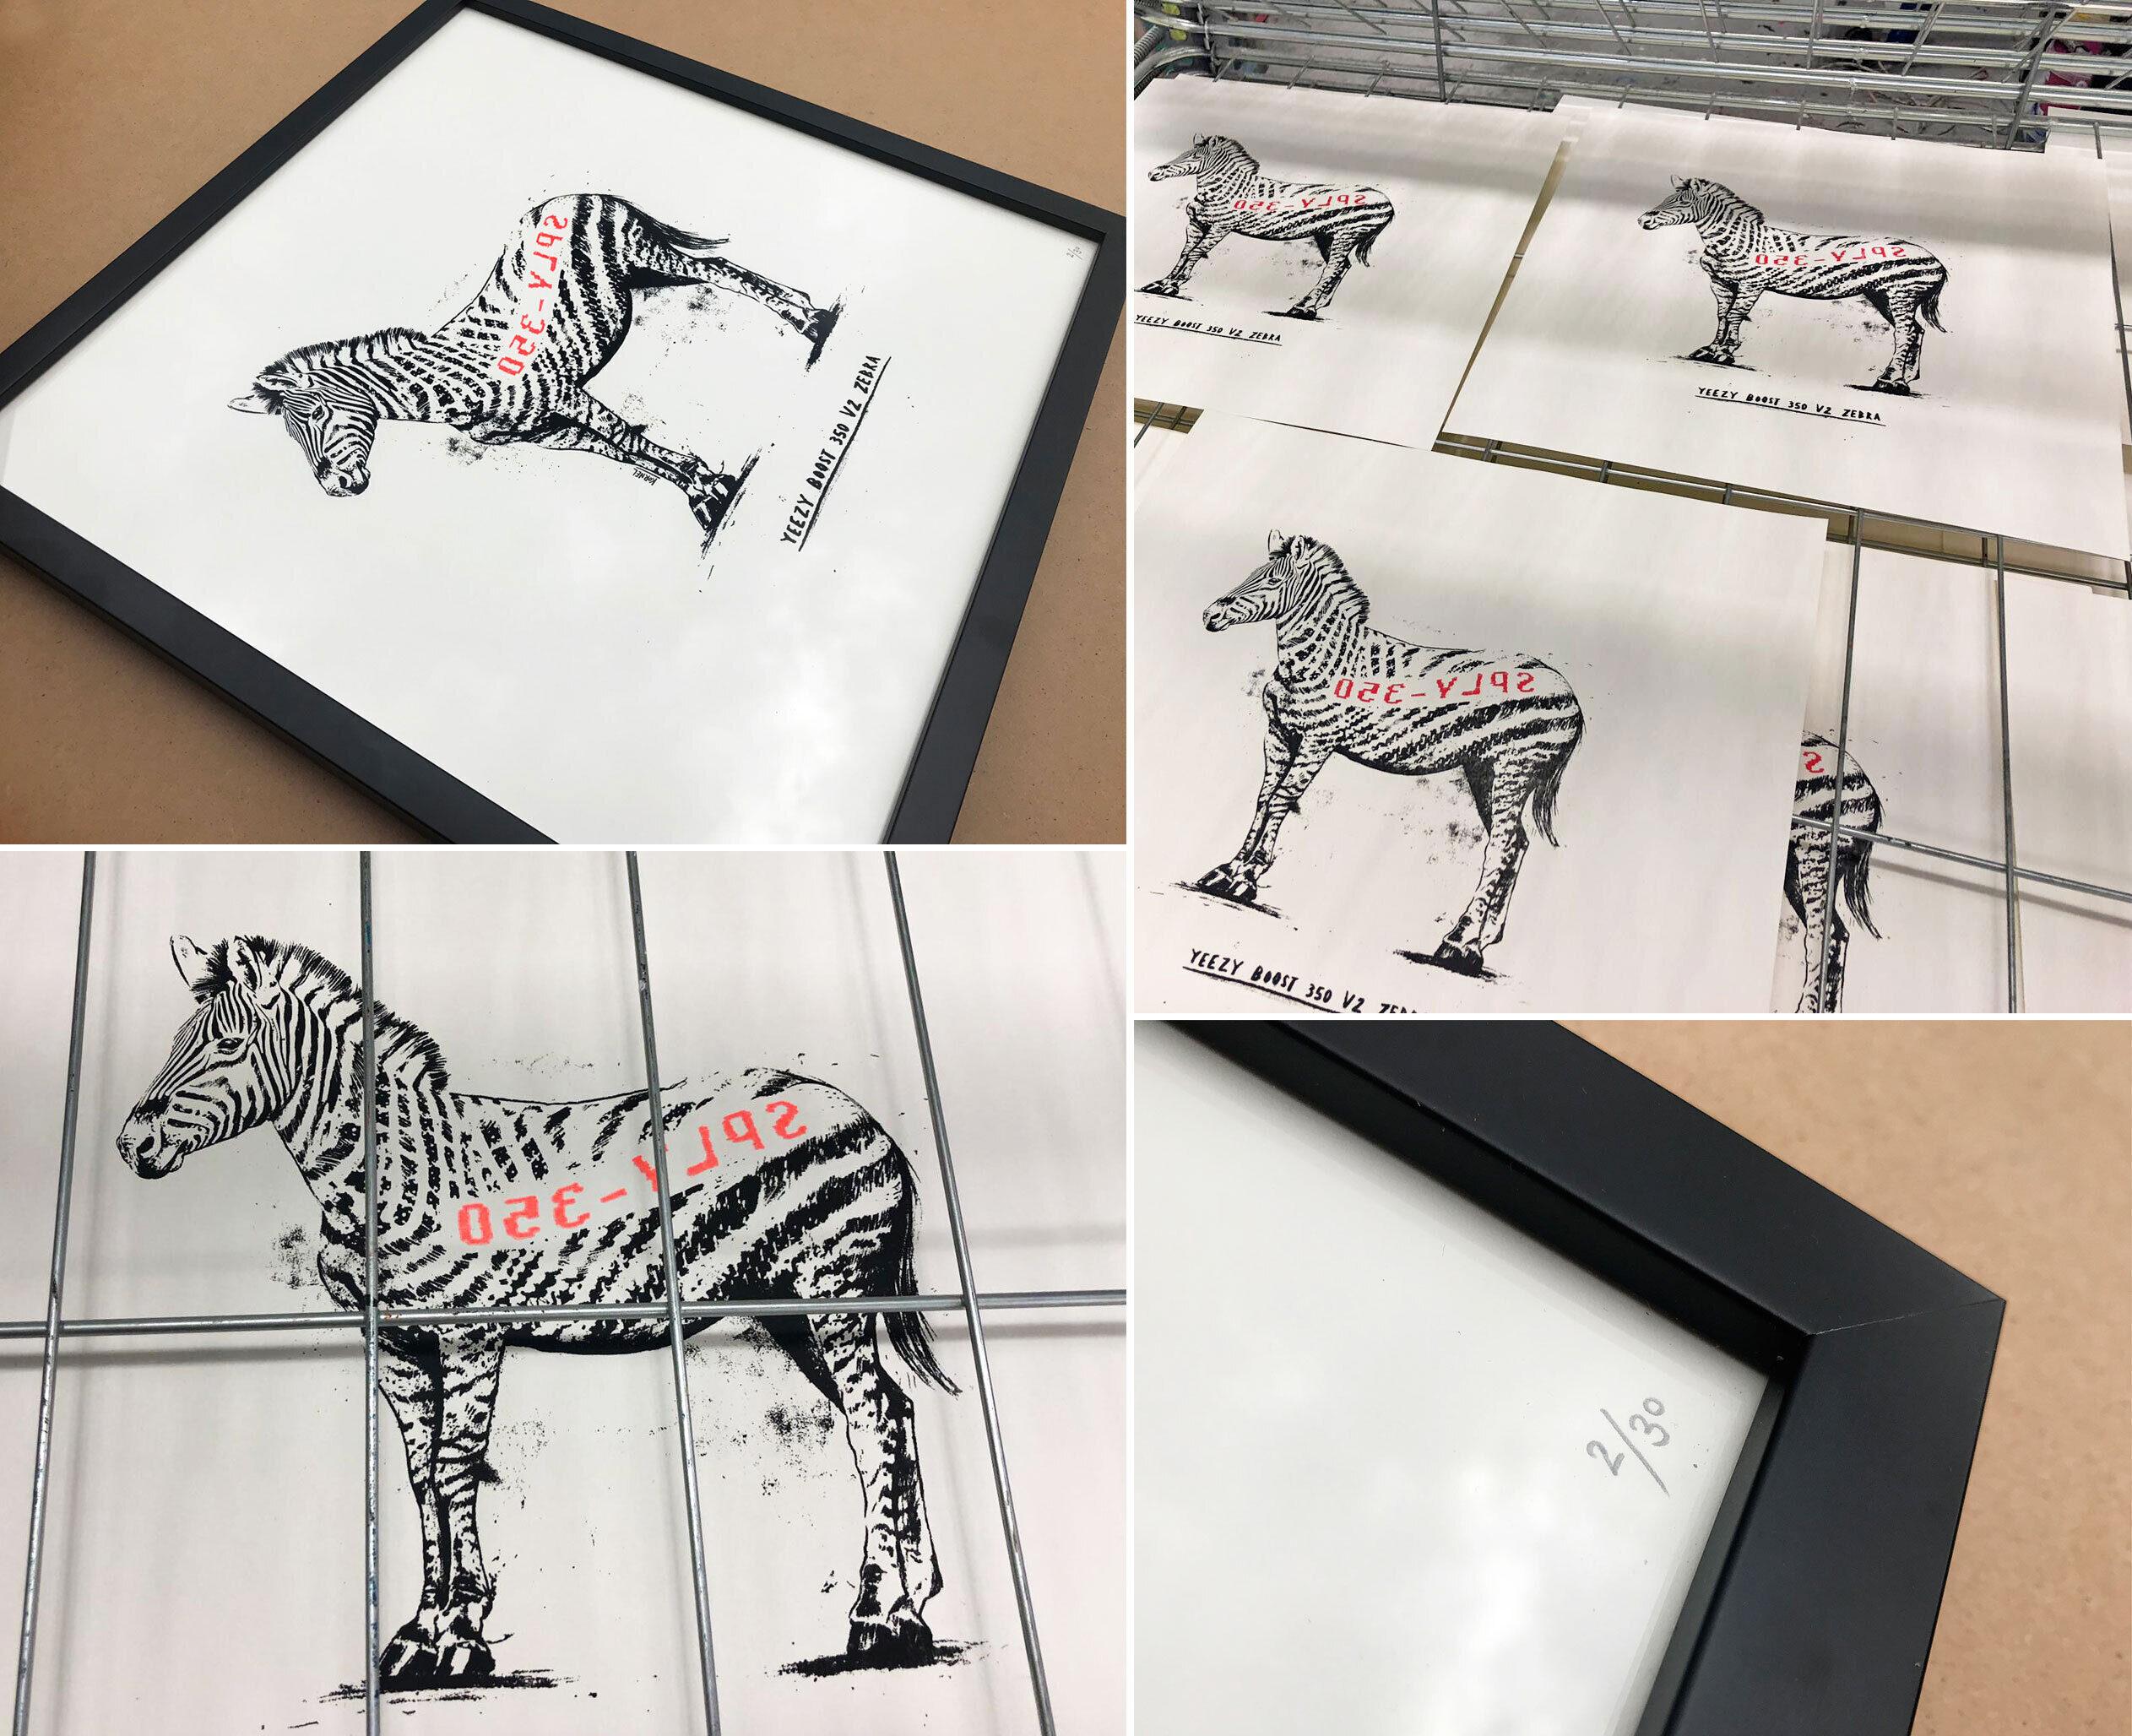 Yeezy siebdruck - Kornel Illustration   Kornel Stadler portfolio